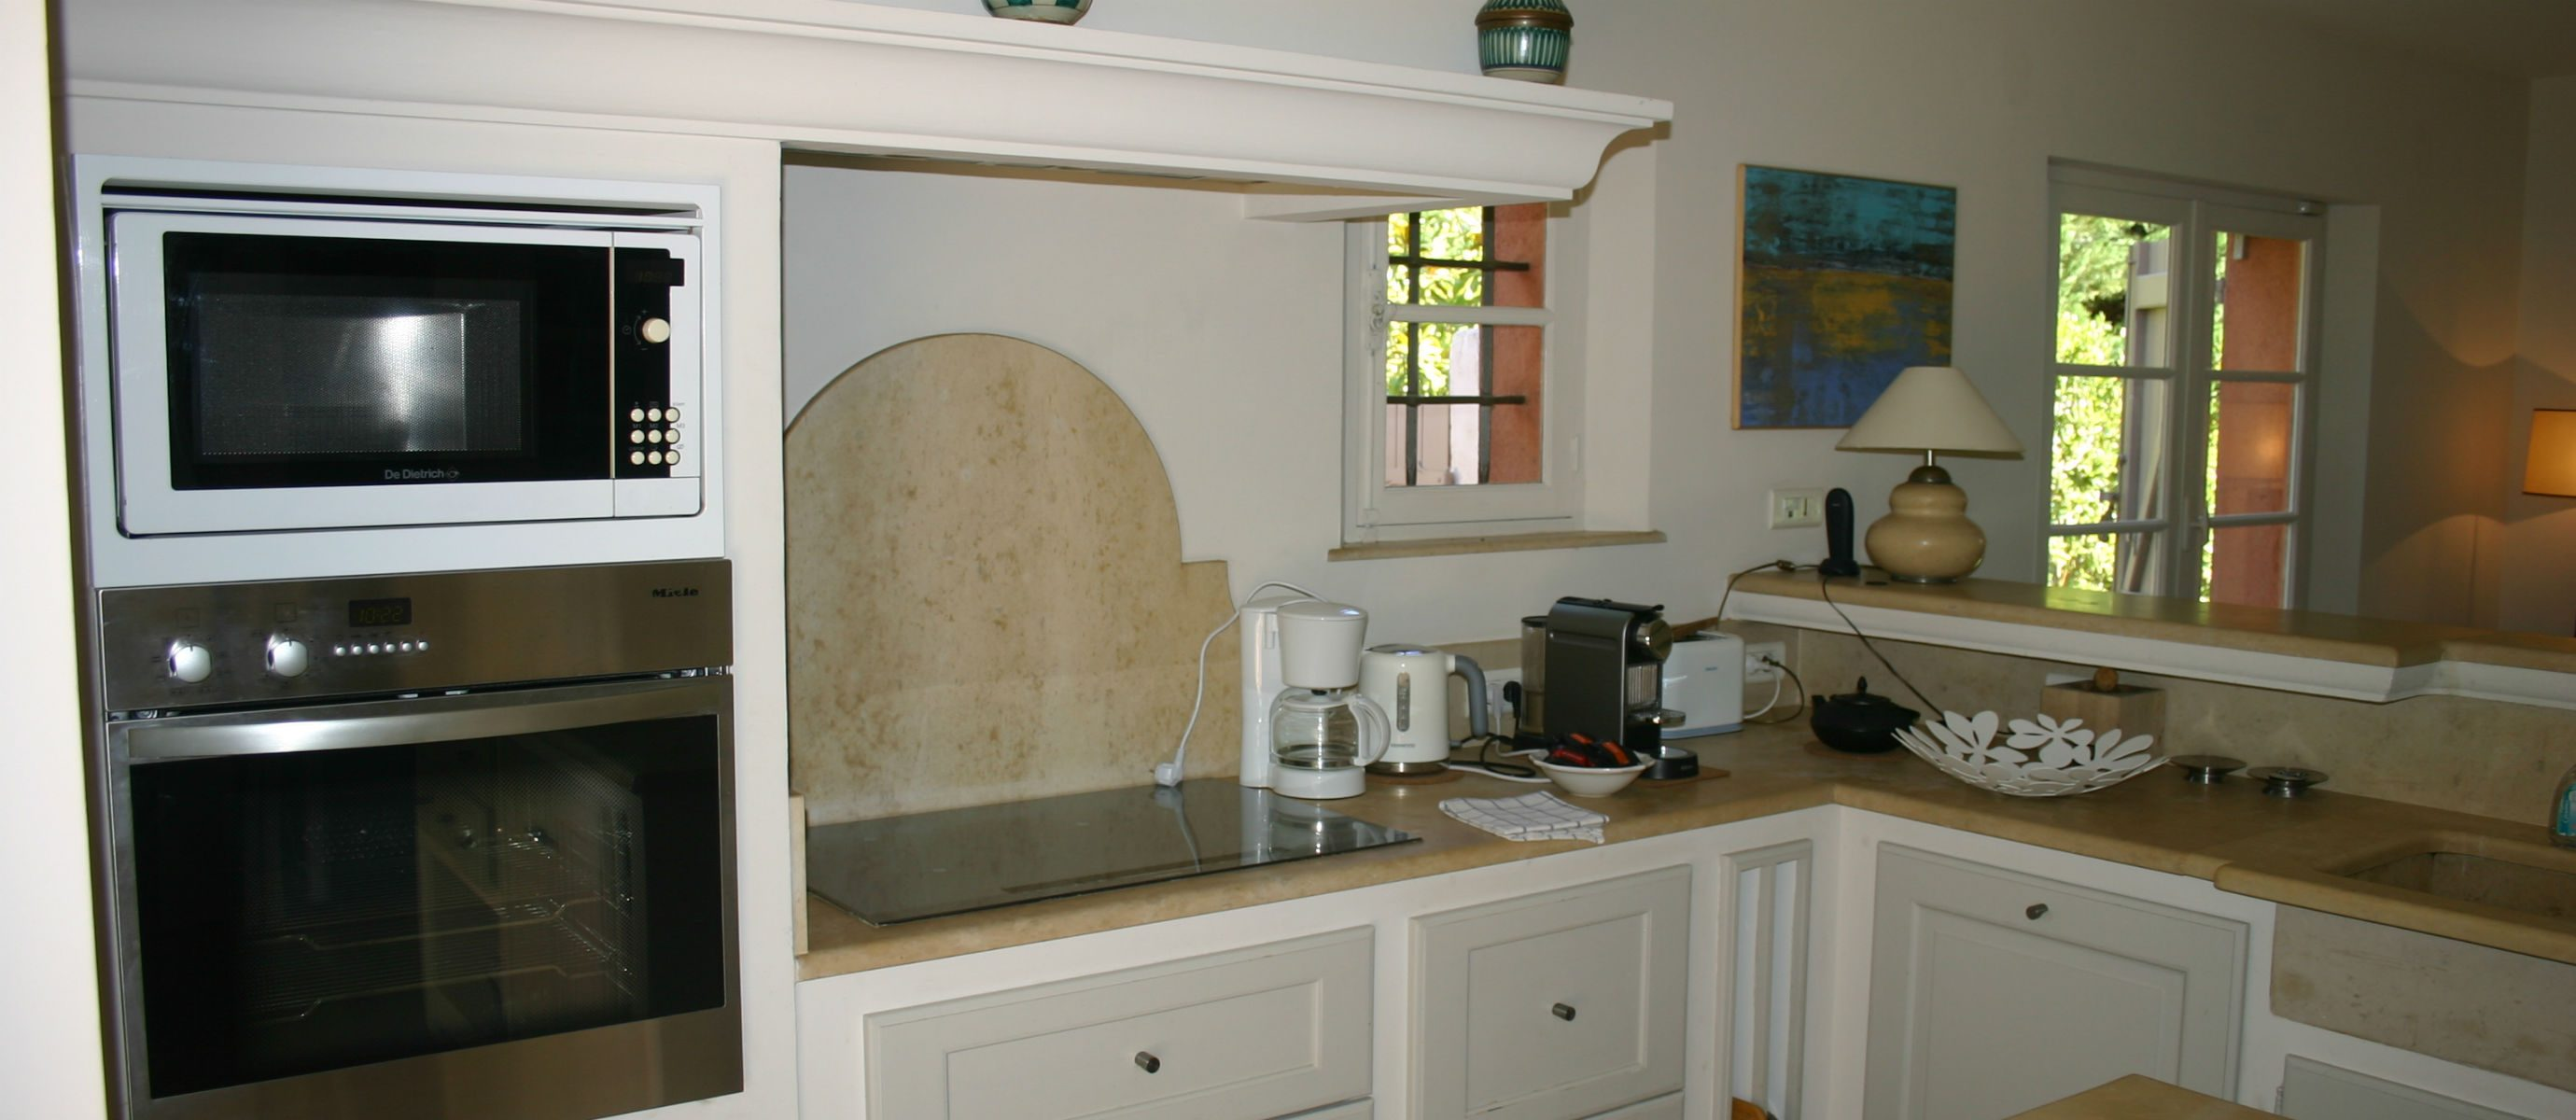 MR. Kitchen. IMG_2394